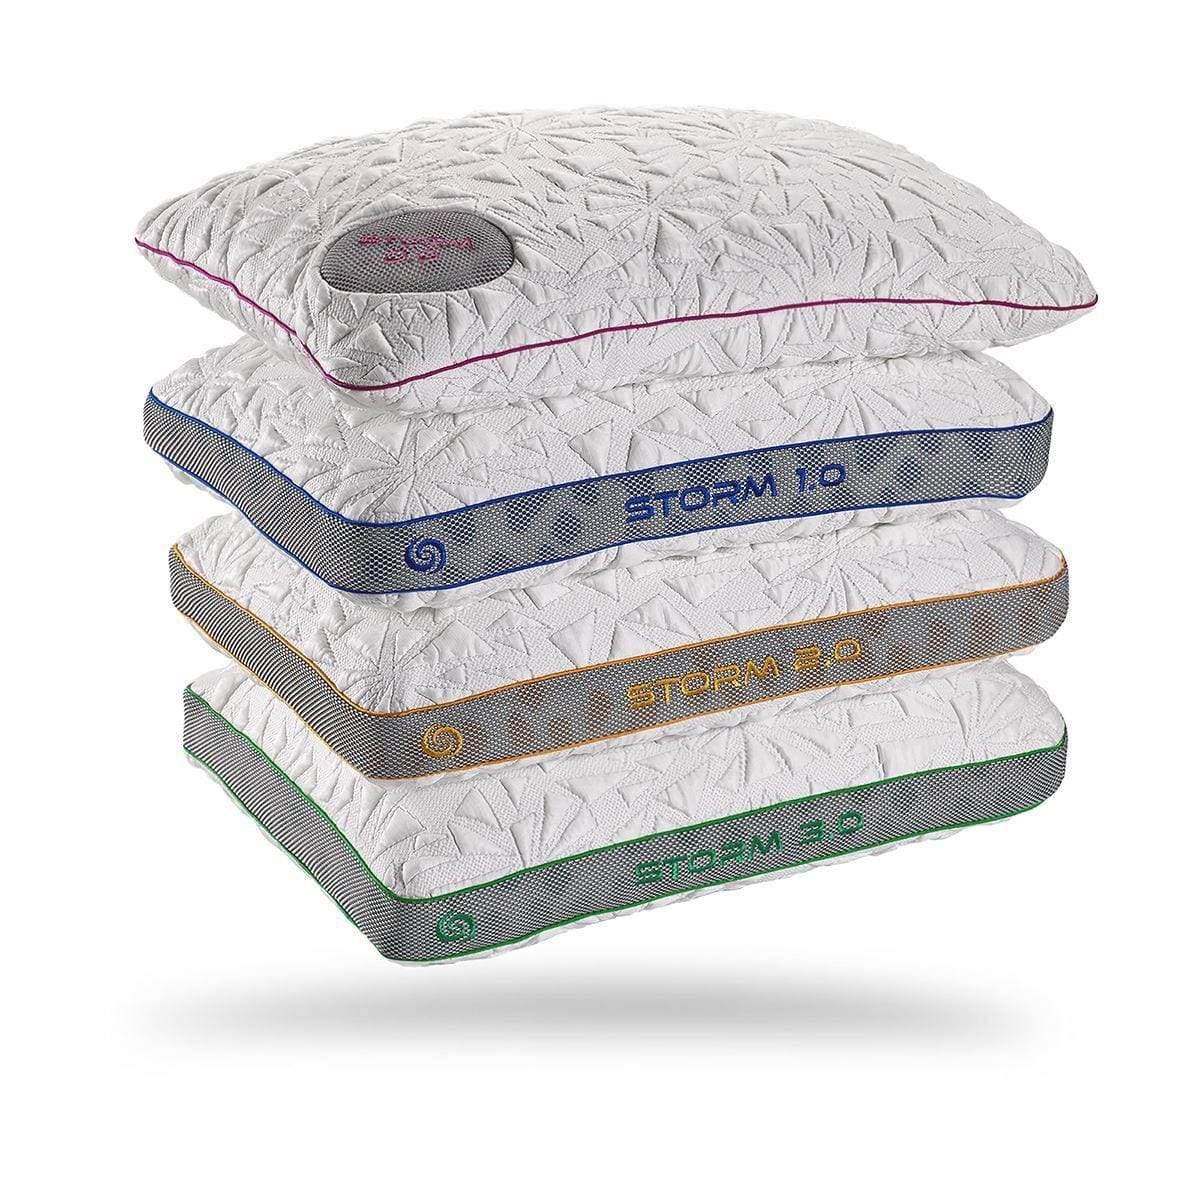 https sleephappens com products bedgear storm series new pillow 0 0